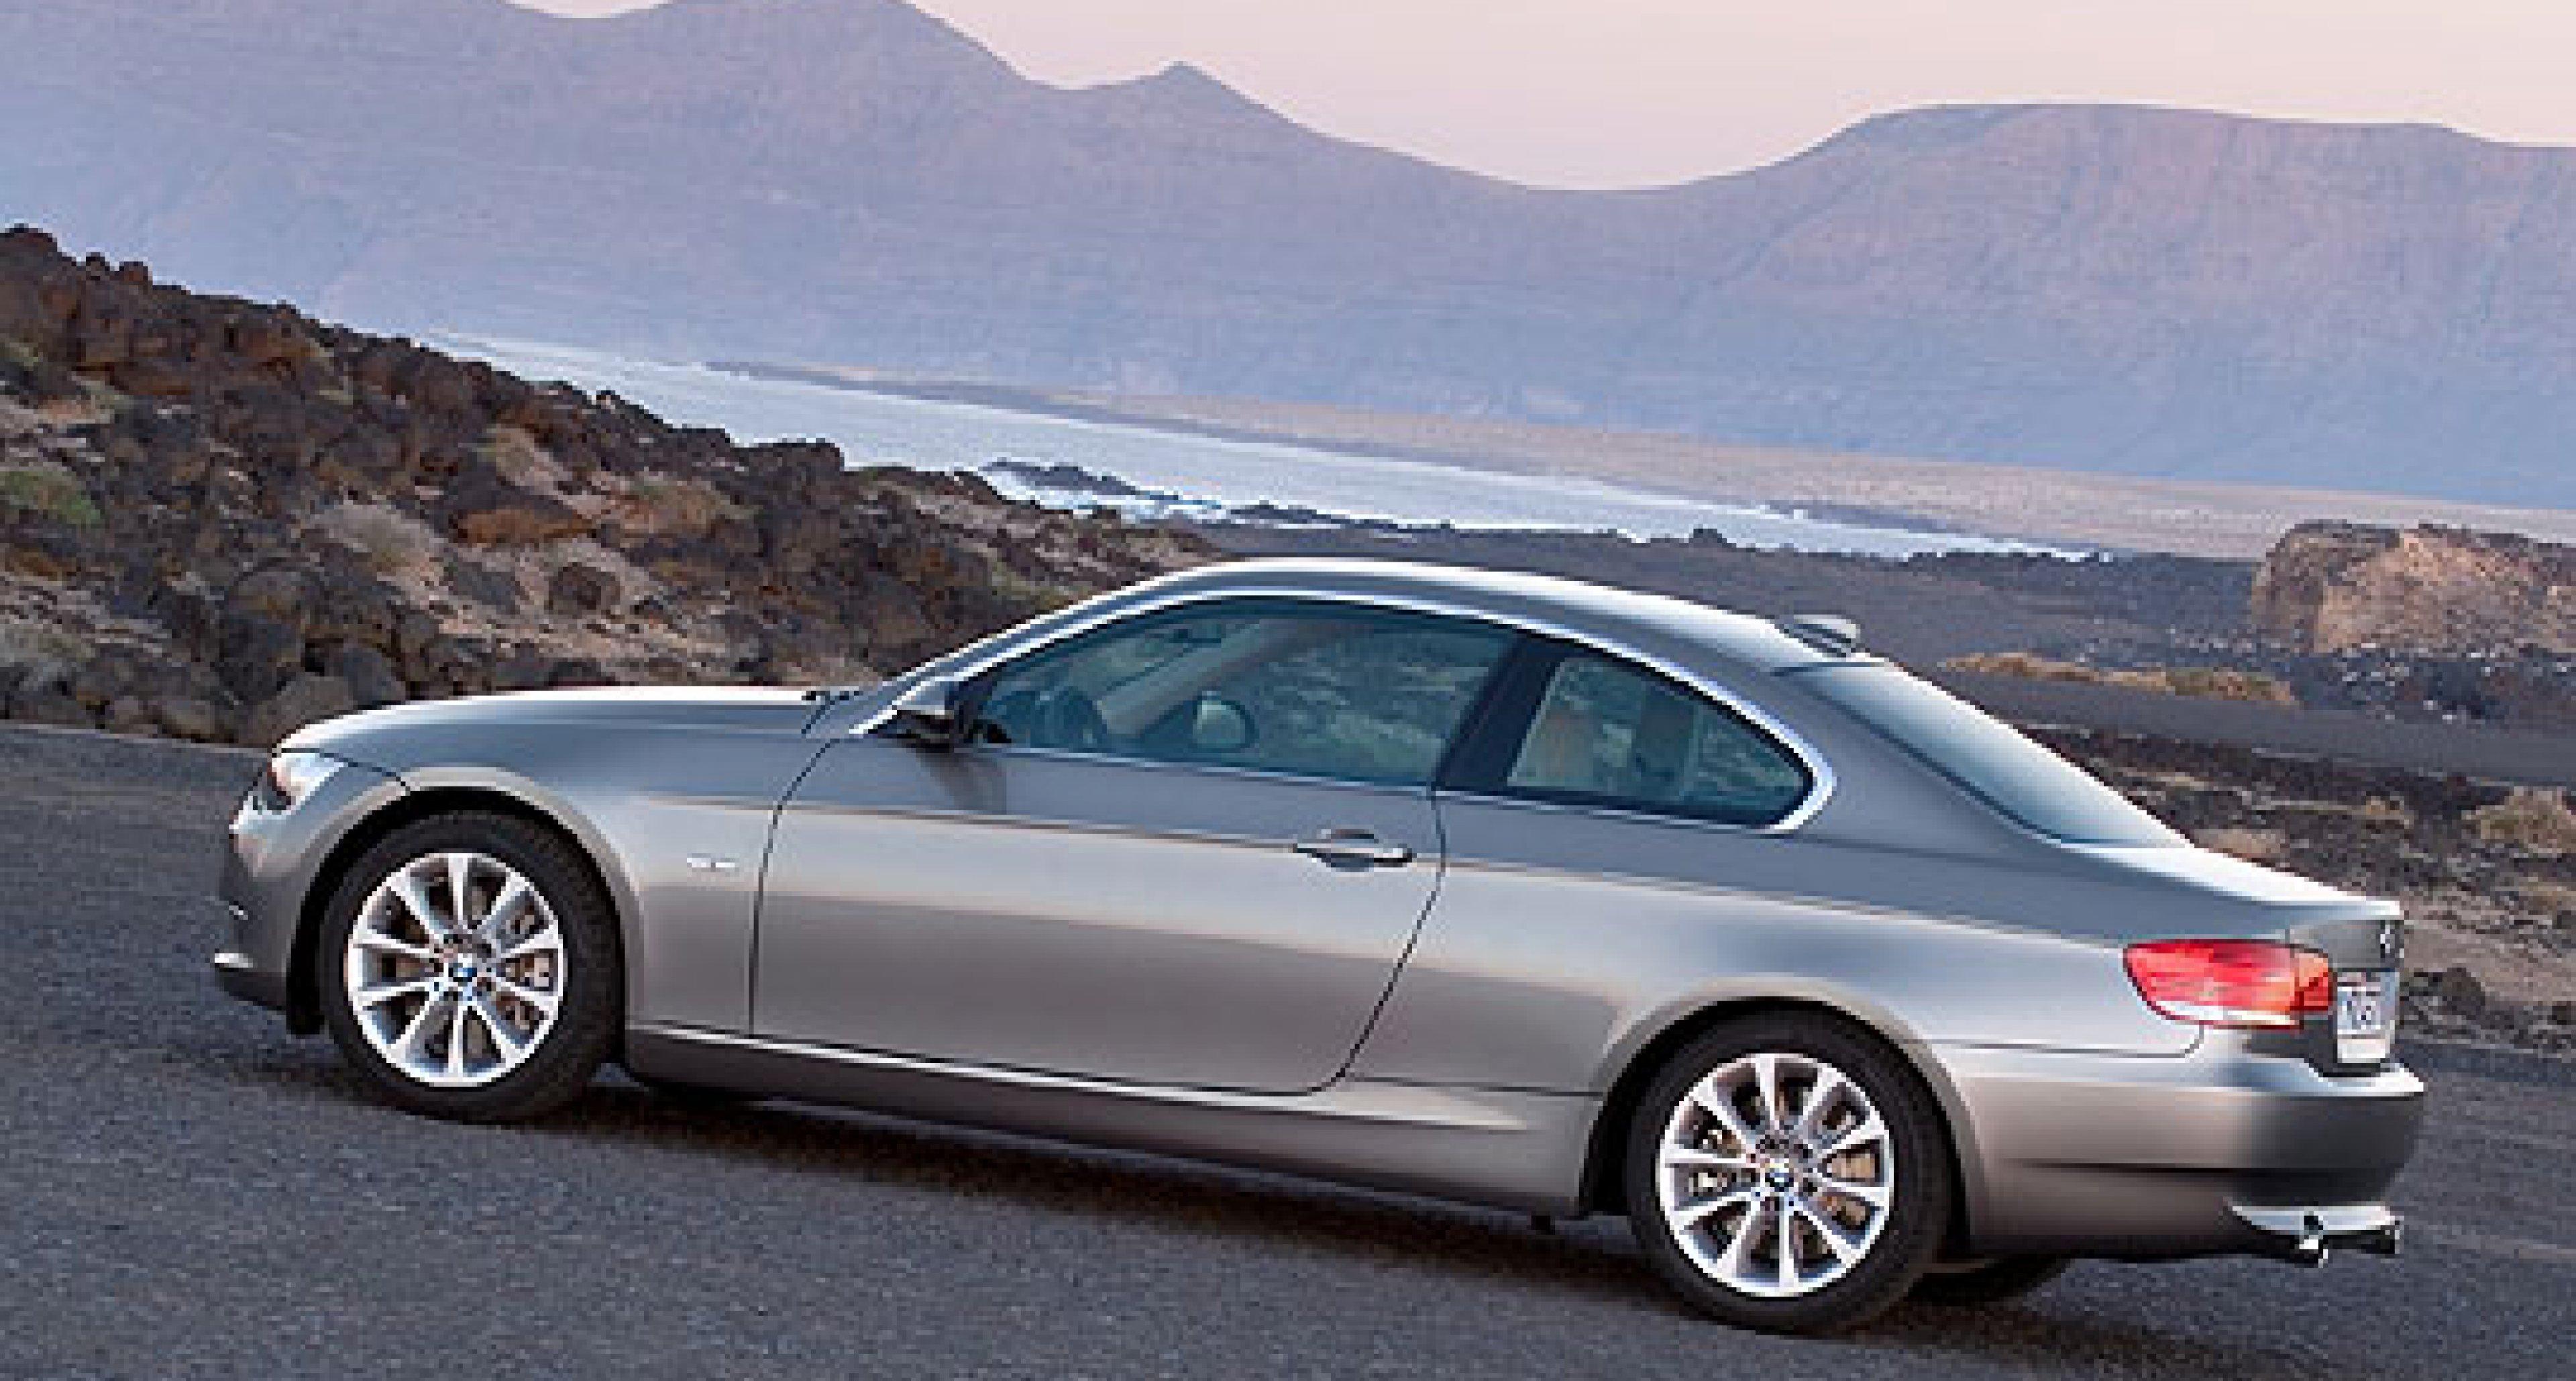 New BMW 3-Series Coupé